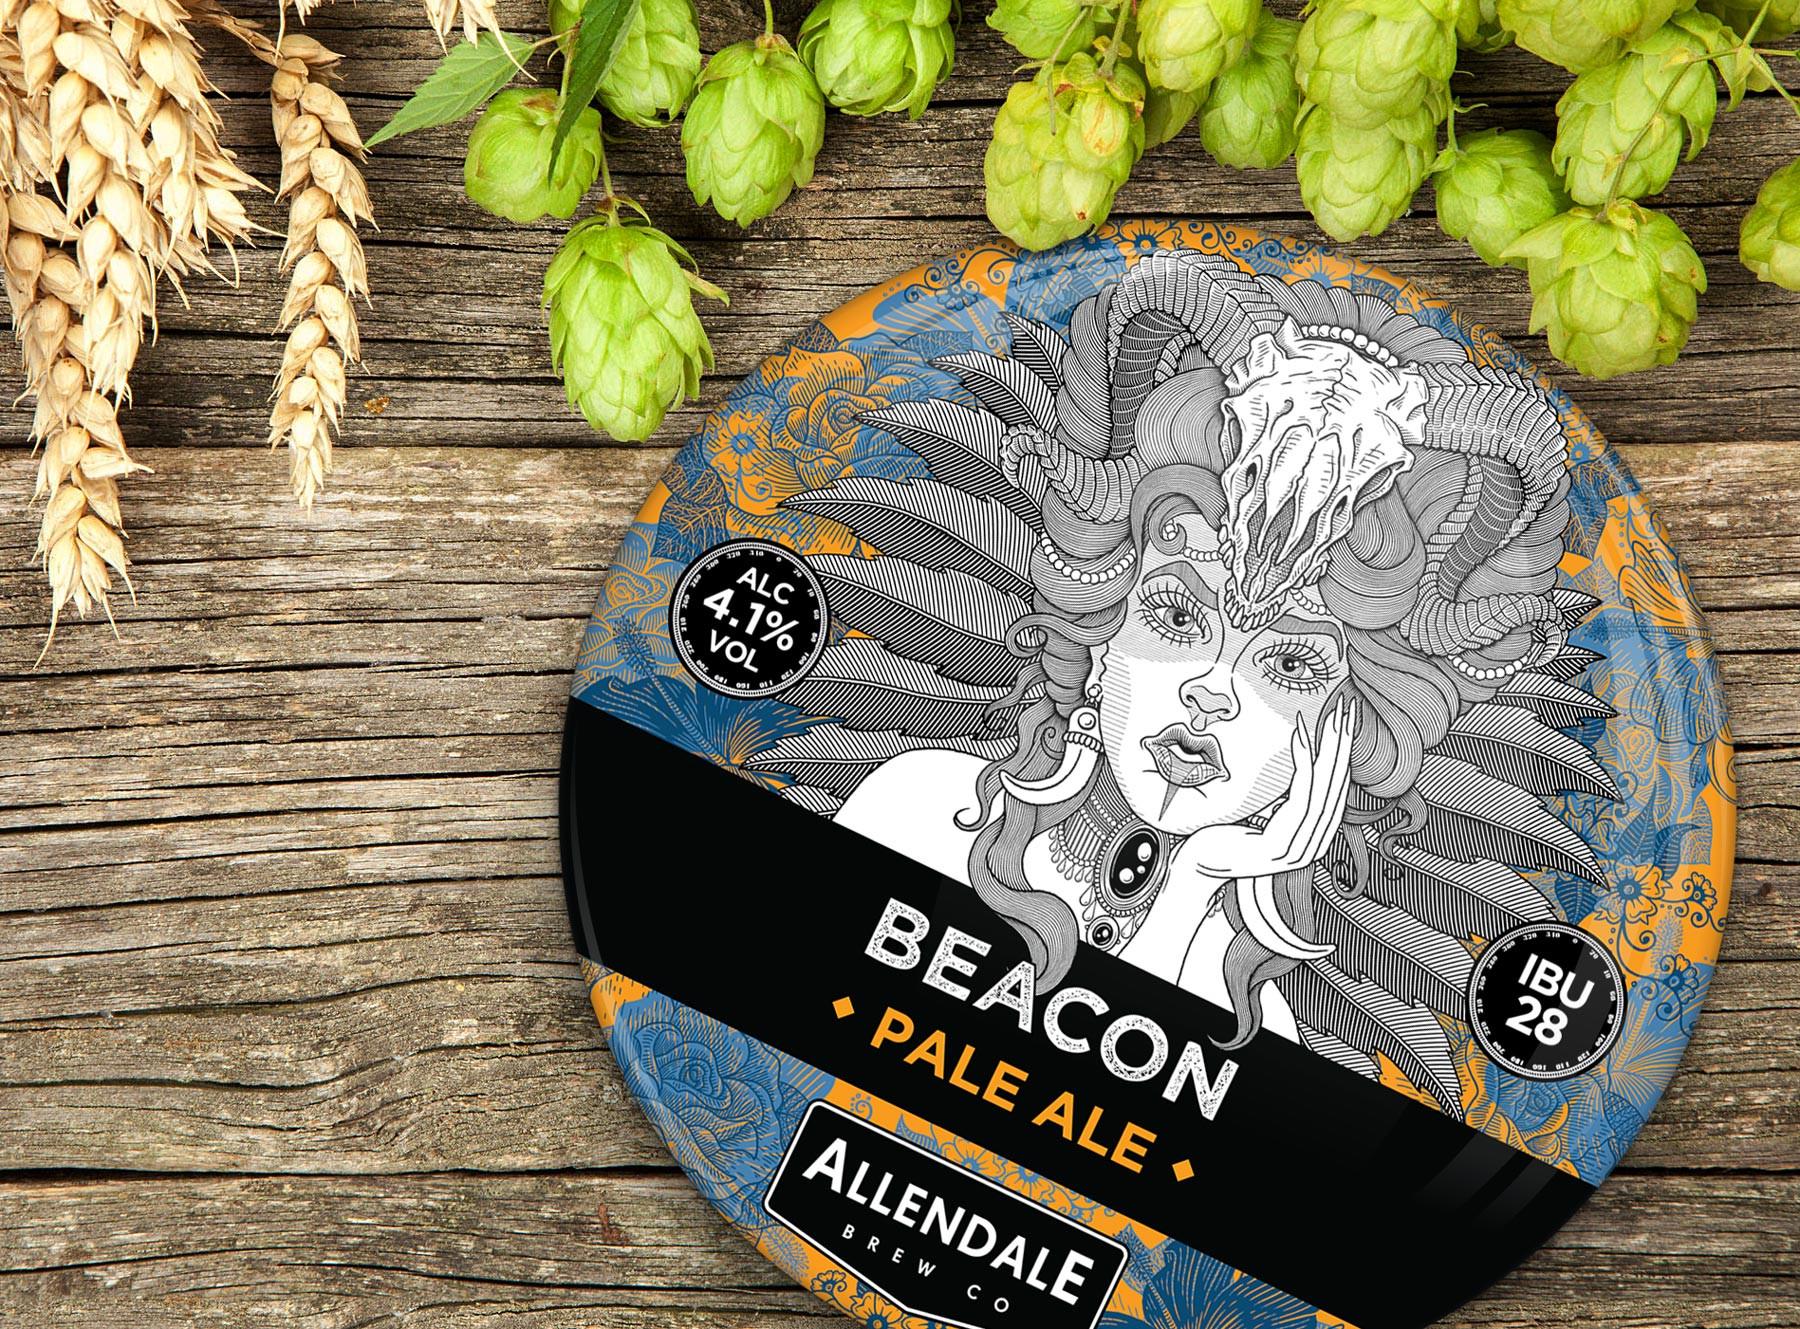 allendale-beacon-pump-clip-beer-label-de